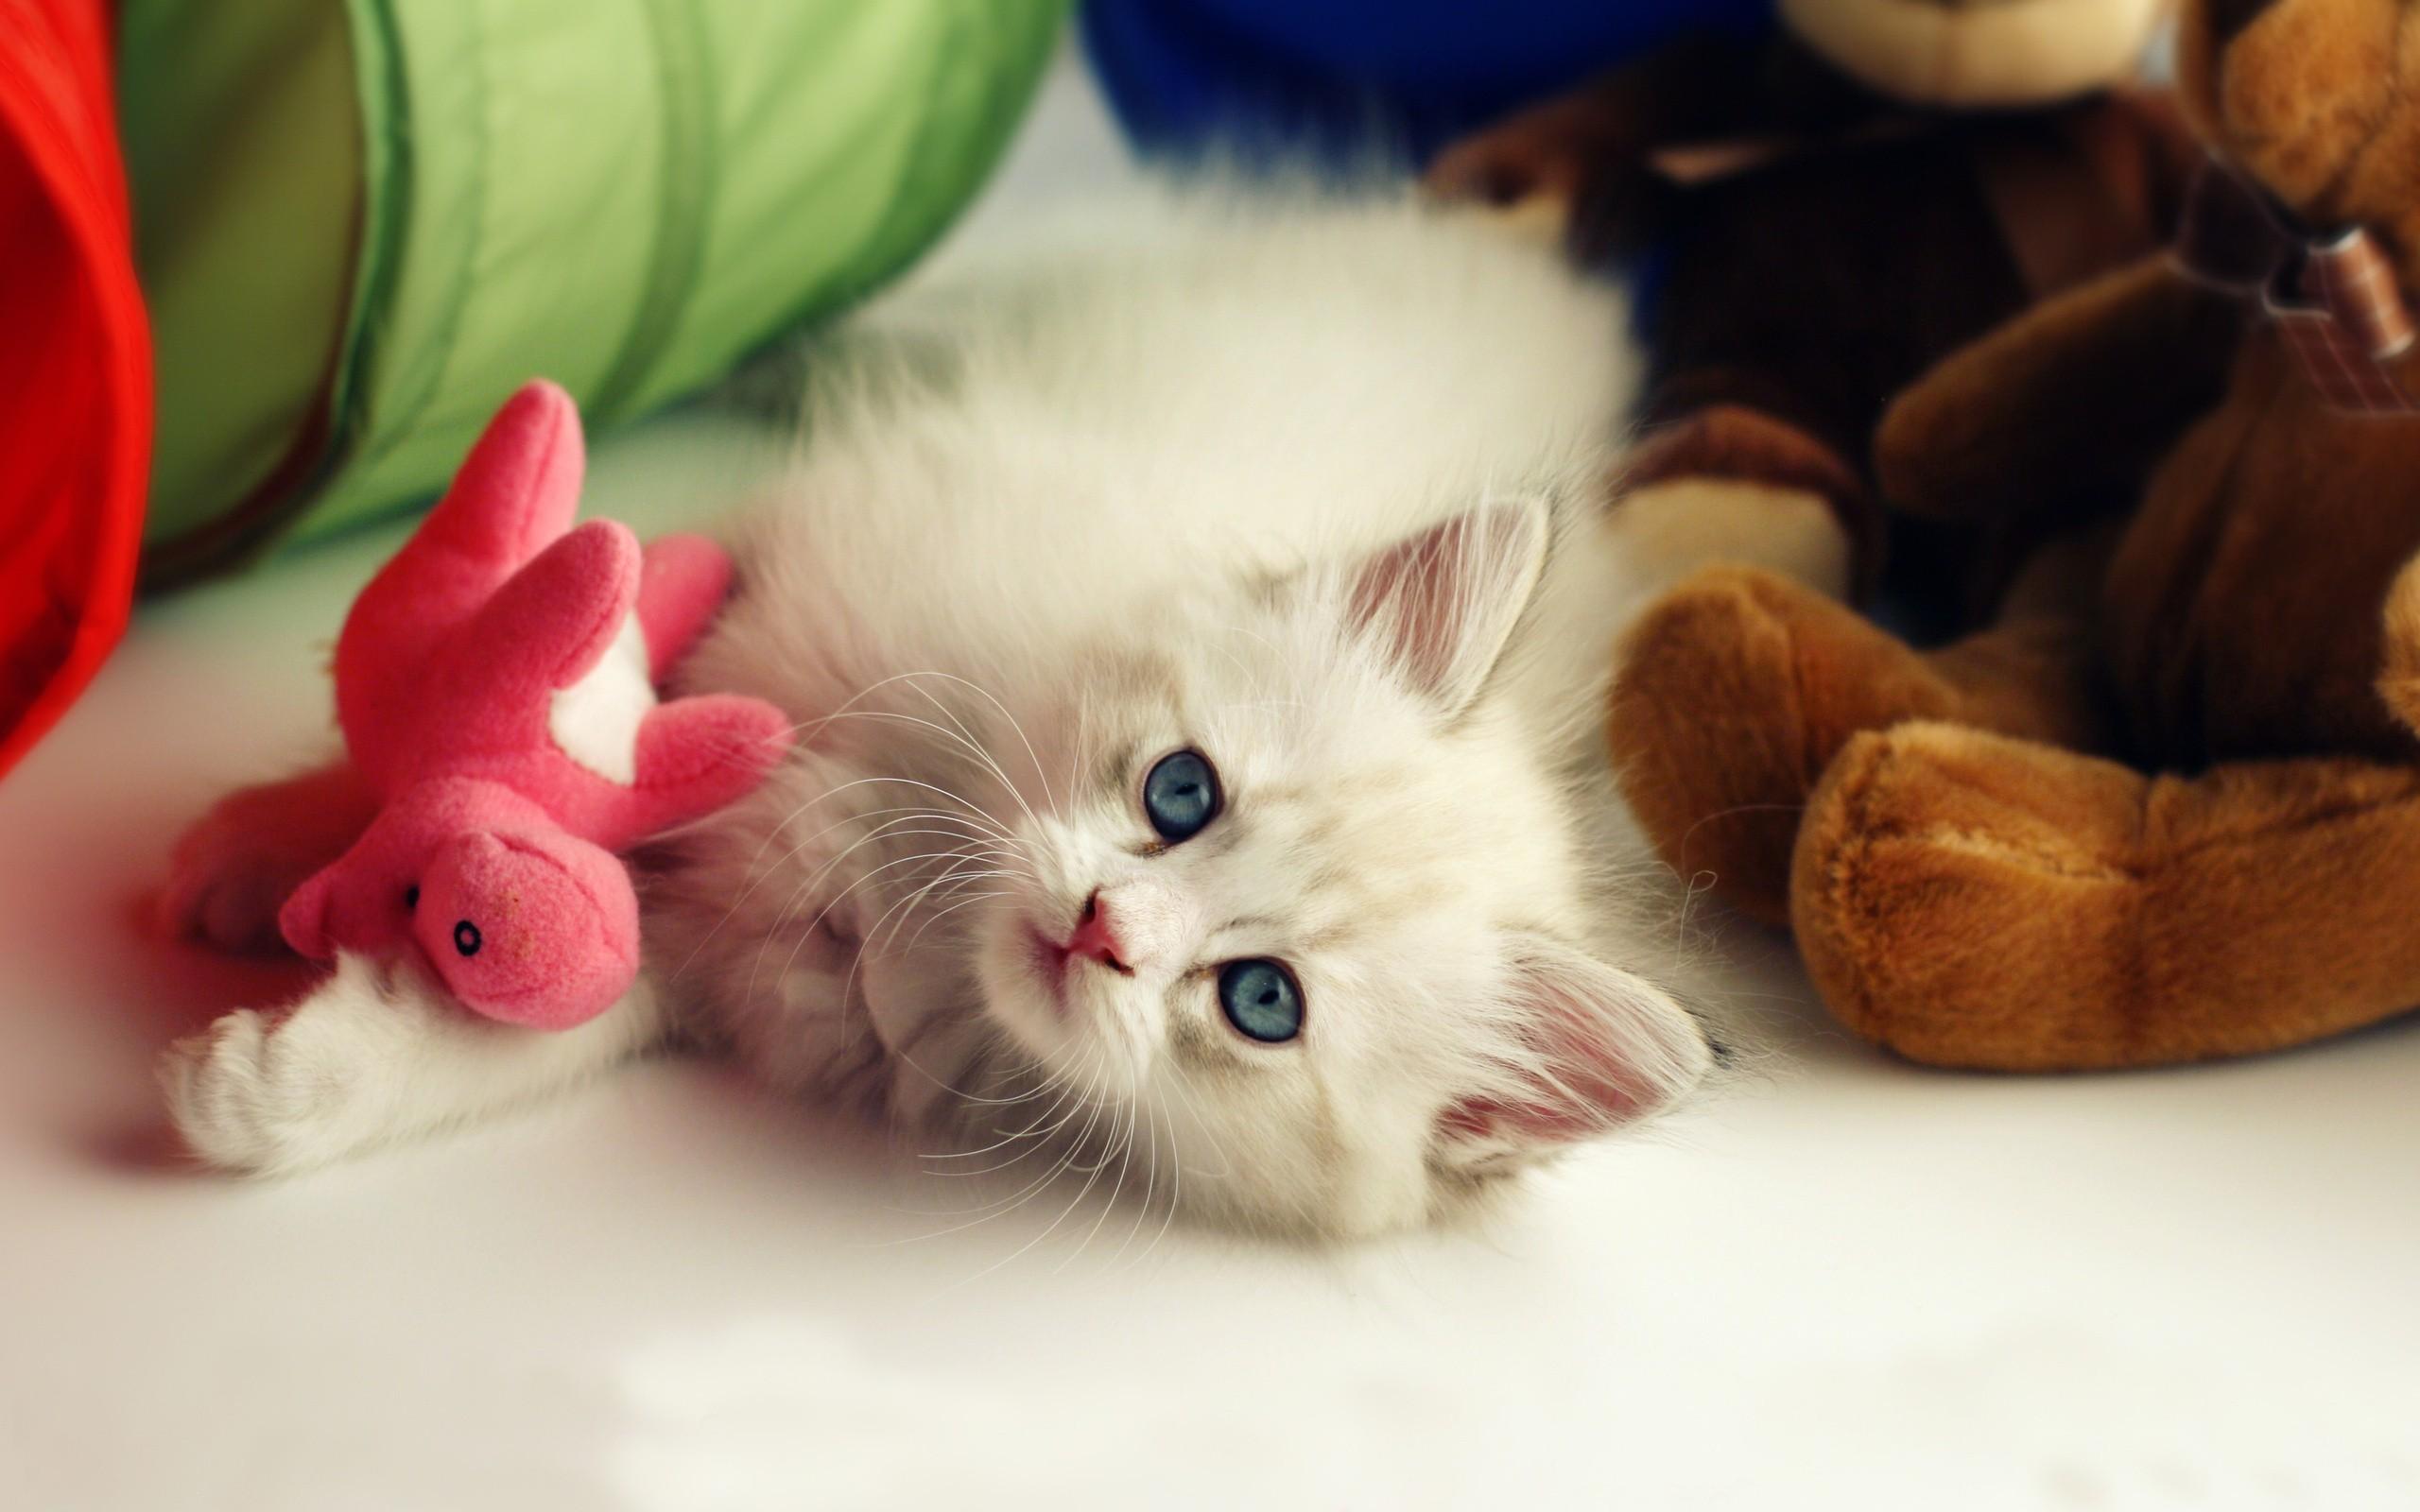 Lots Of Kittens Wallpaper – wallpaper. | Cute Kittens | Pinterest | Animal  wallpaper and Animal